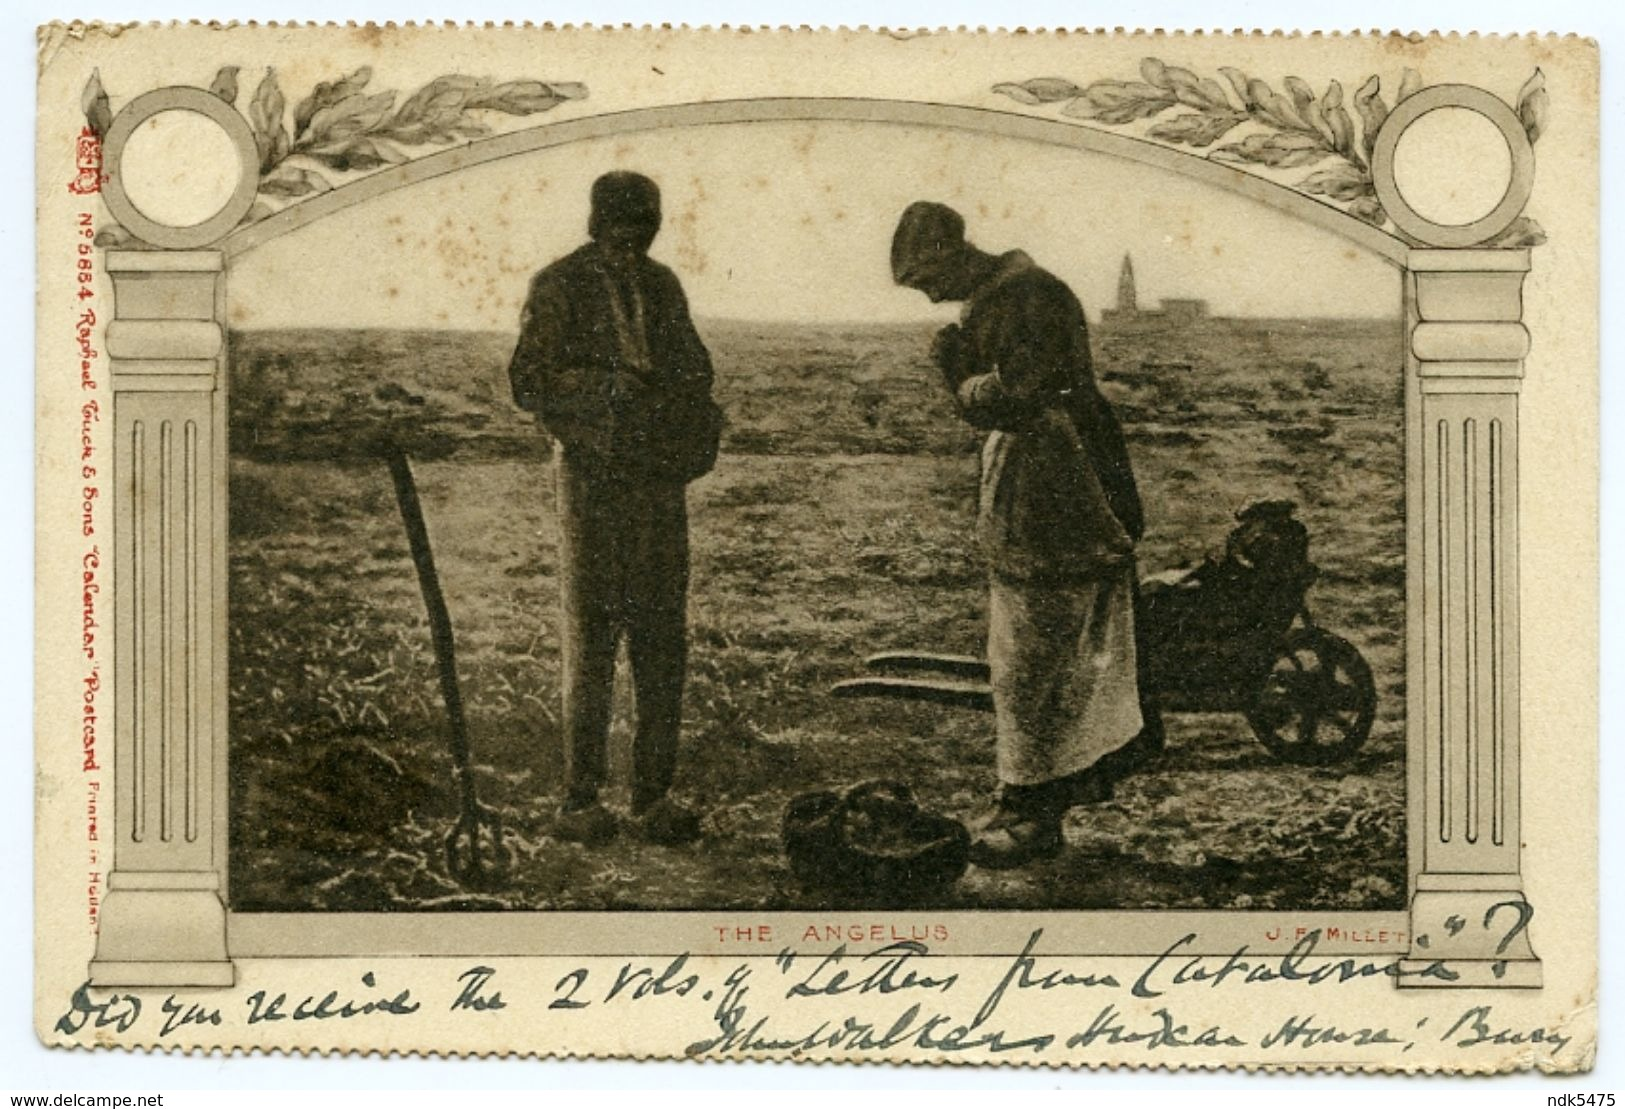 J.F. MILLET : THE ANGELUS / ADDRESSEE - SEYMOUR LUCAS, R.A., WEST HAMPSTEAD / POSTMARK - BURY, LANCS. - 1900-1949